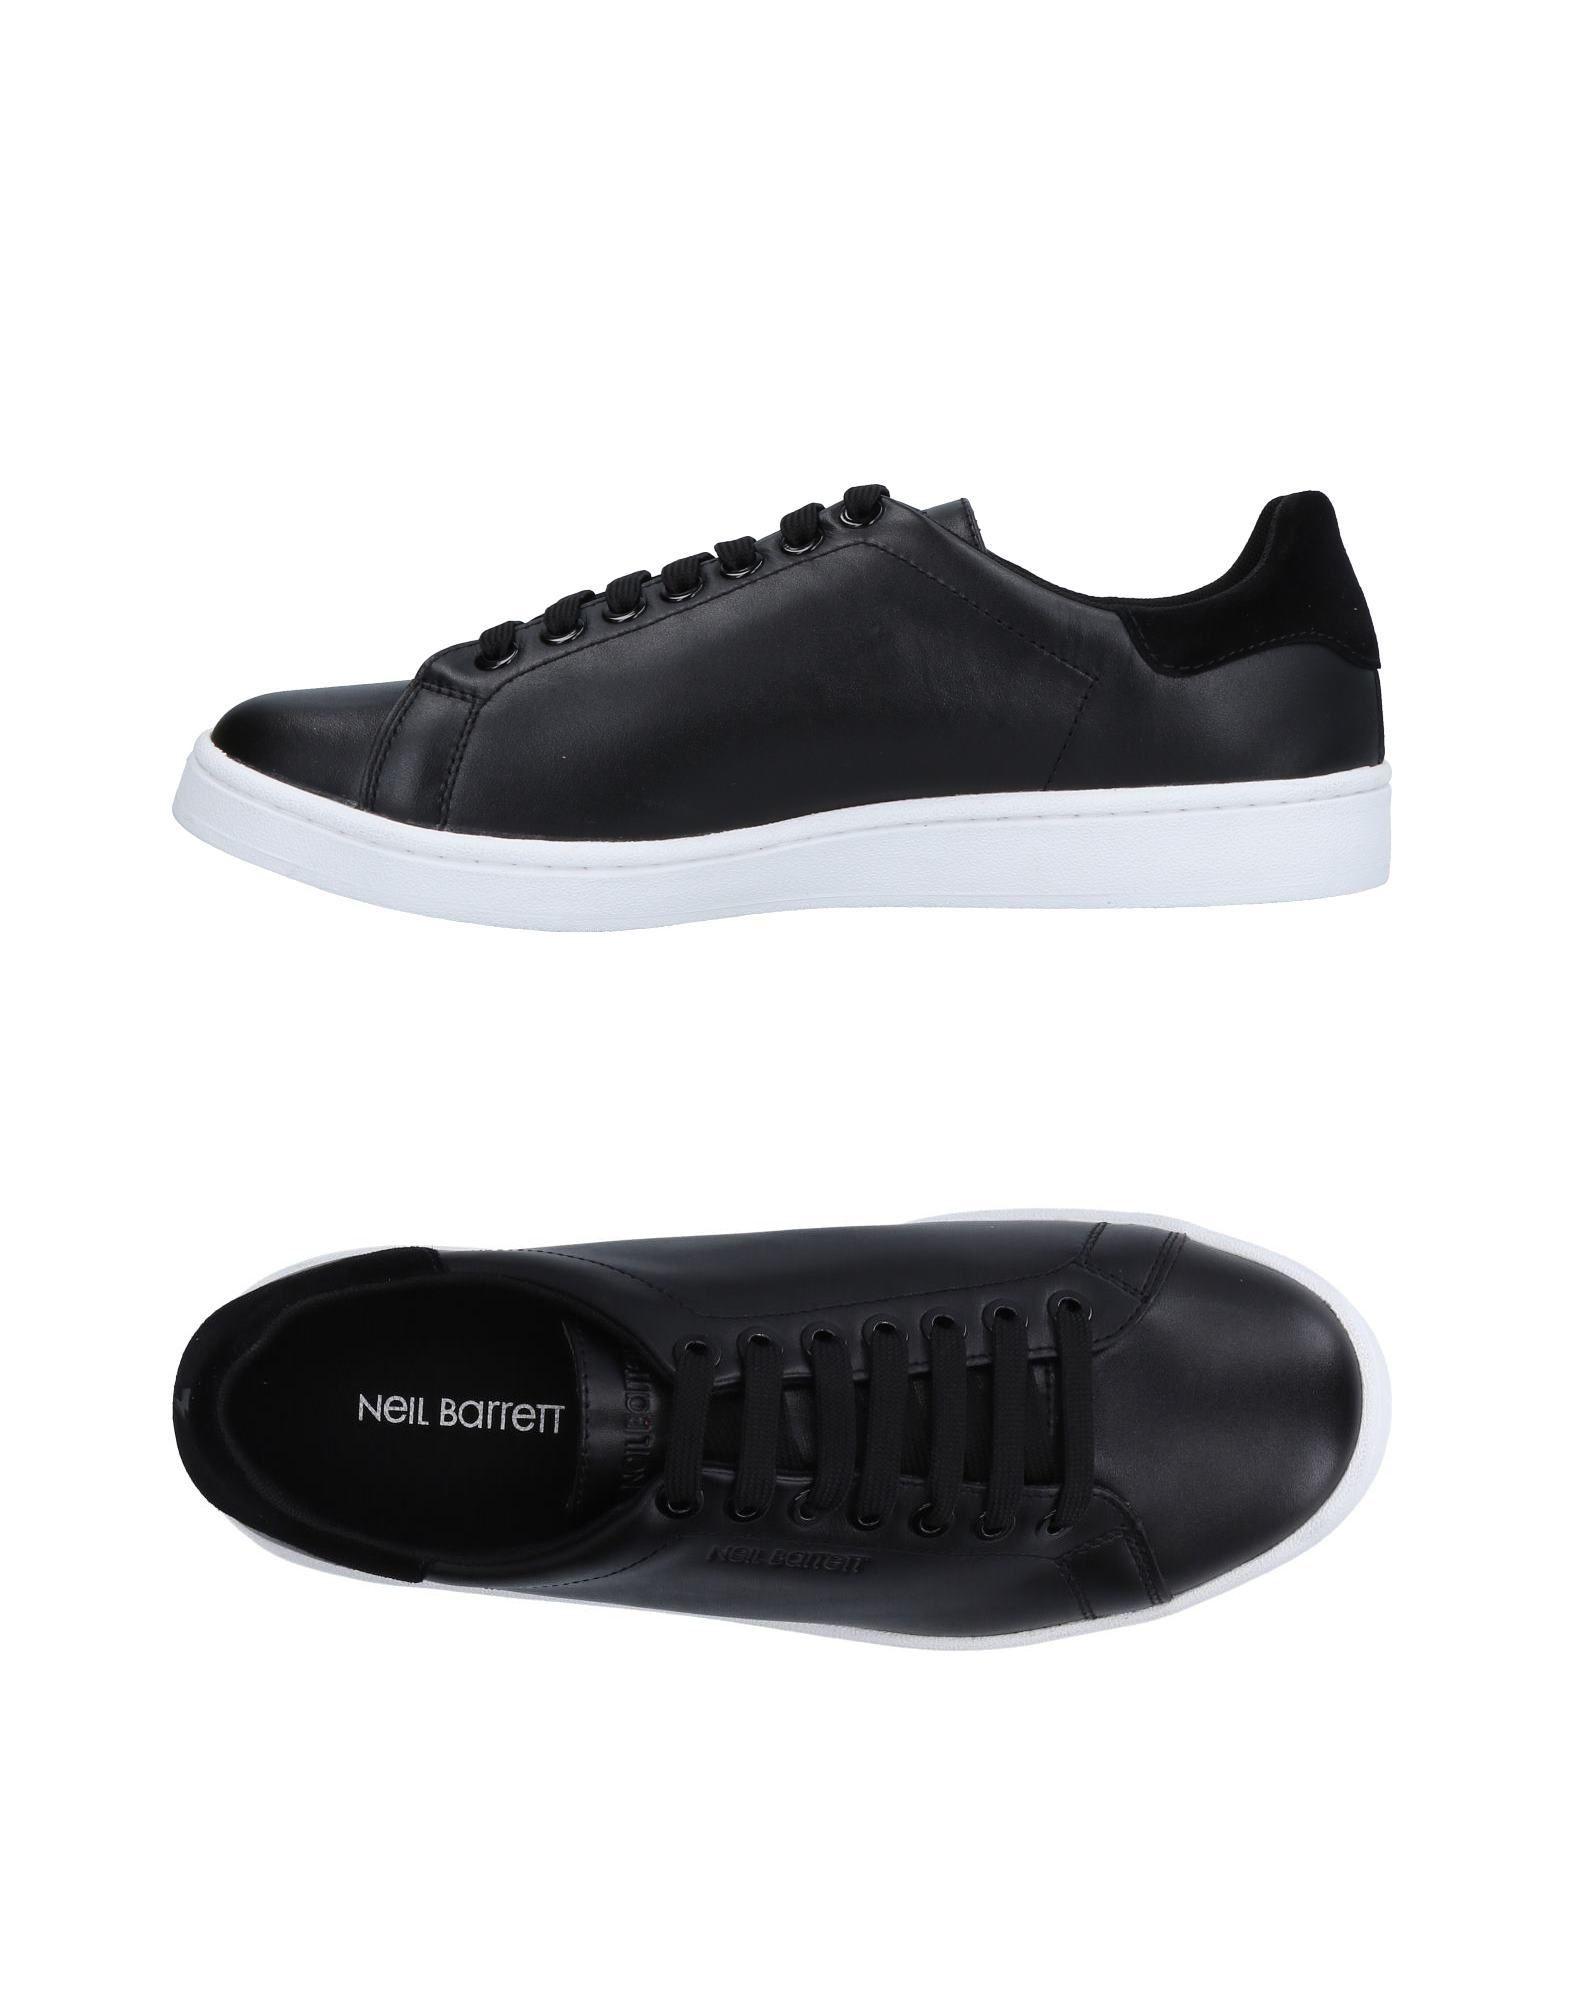 NEIL BARRETT Низкие кеды и кроссовки neil barrett низкие кеды и кроссовки